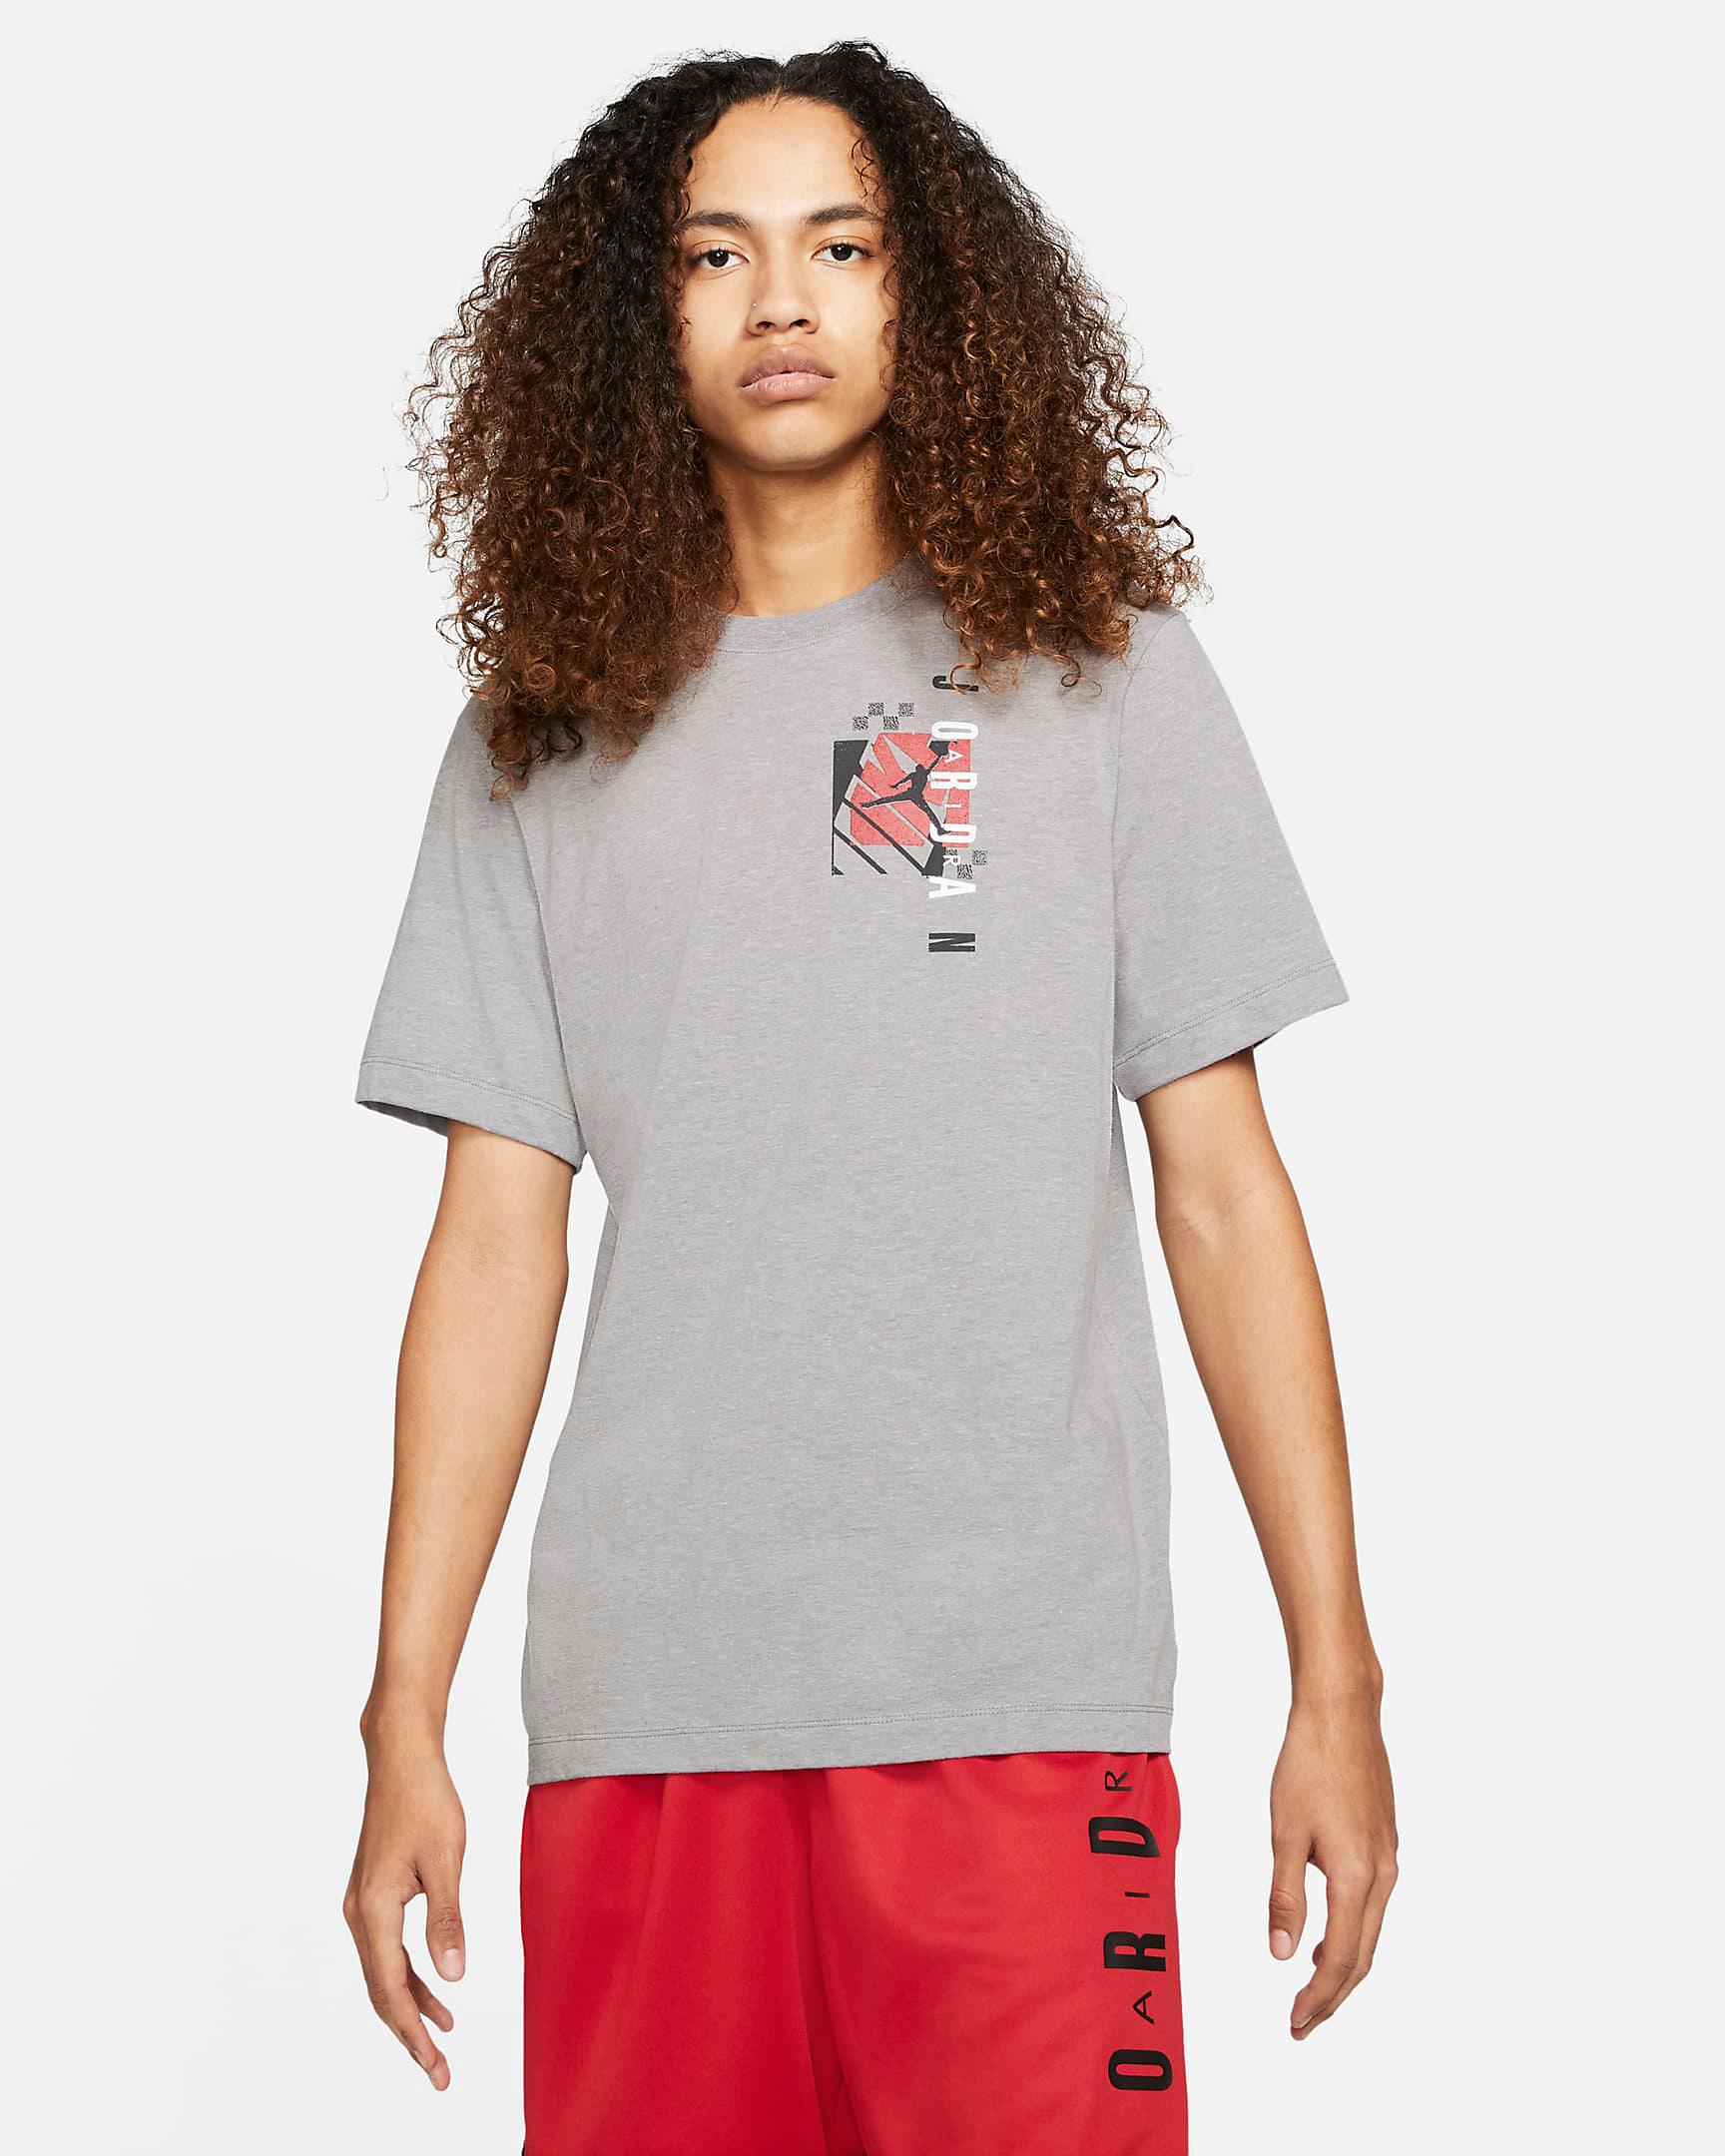 jordan-air-futura-shirt-grey-black-red-summer-2021-3